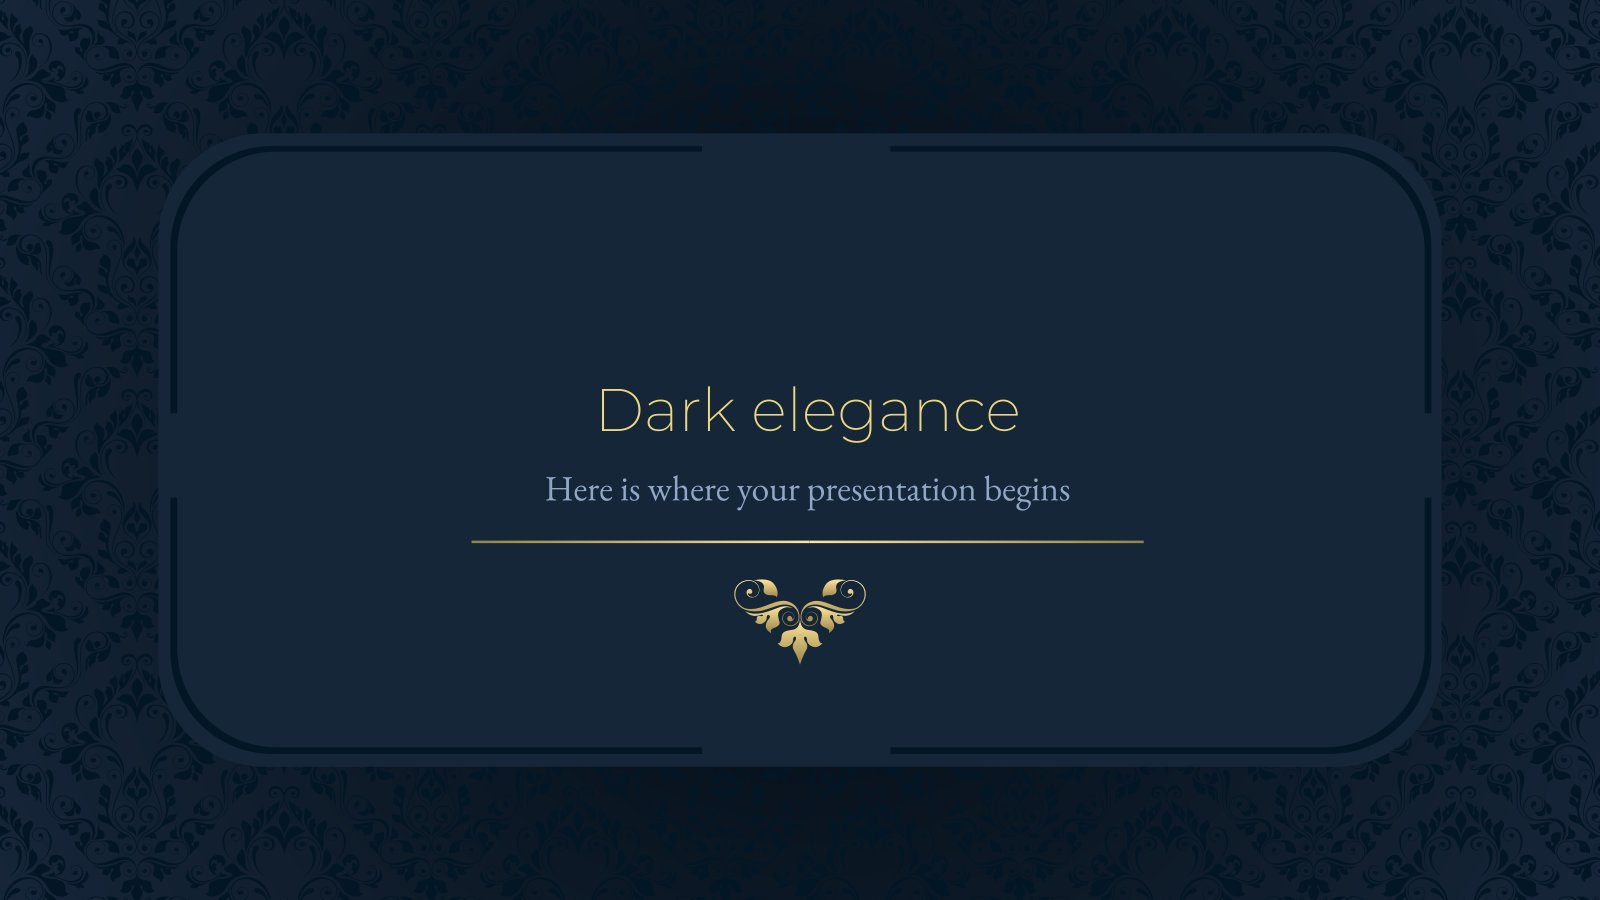 Plantilla de presentación Elegancia oscura